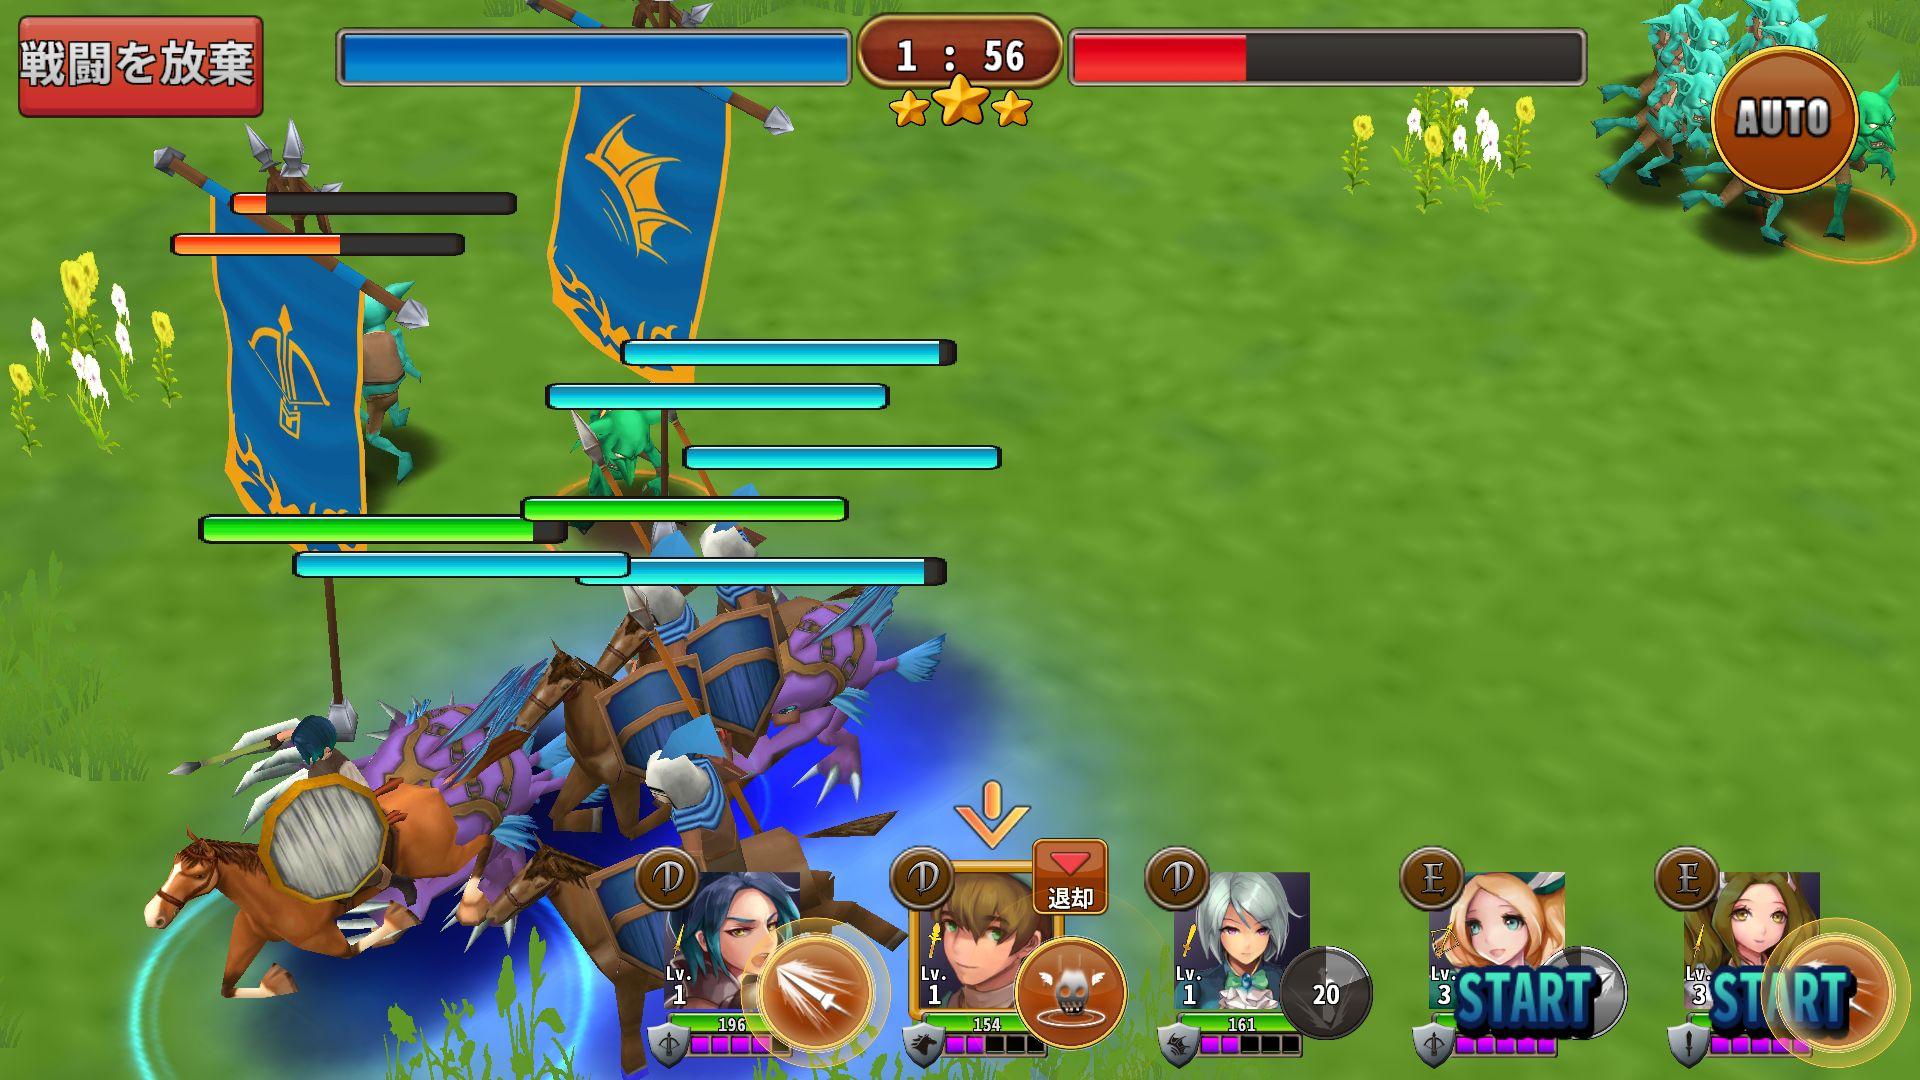 androidアプリ キングダムスレイヤー(Kingdom Slayer)攻略スクリーンショット5